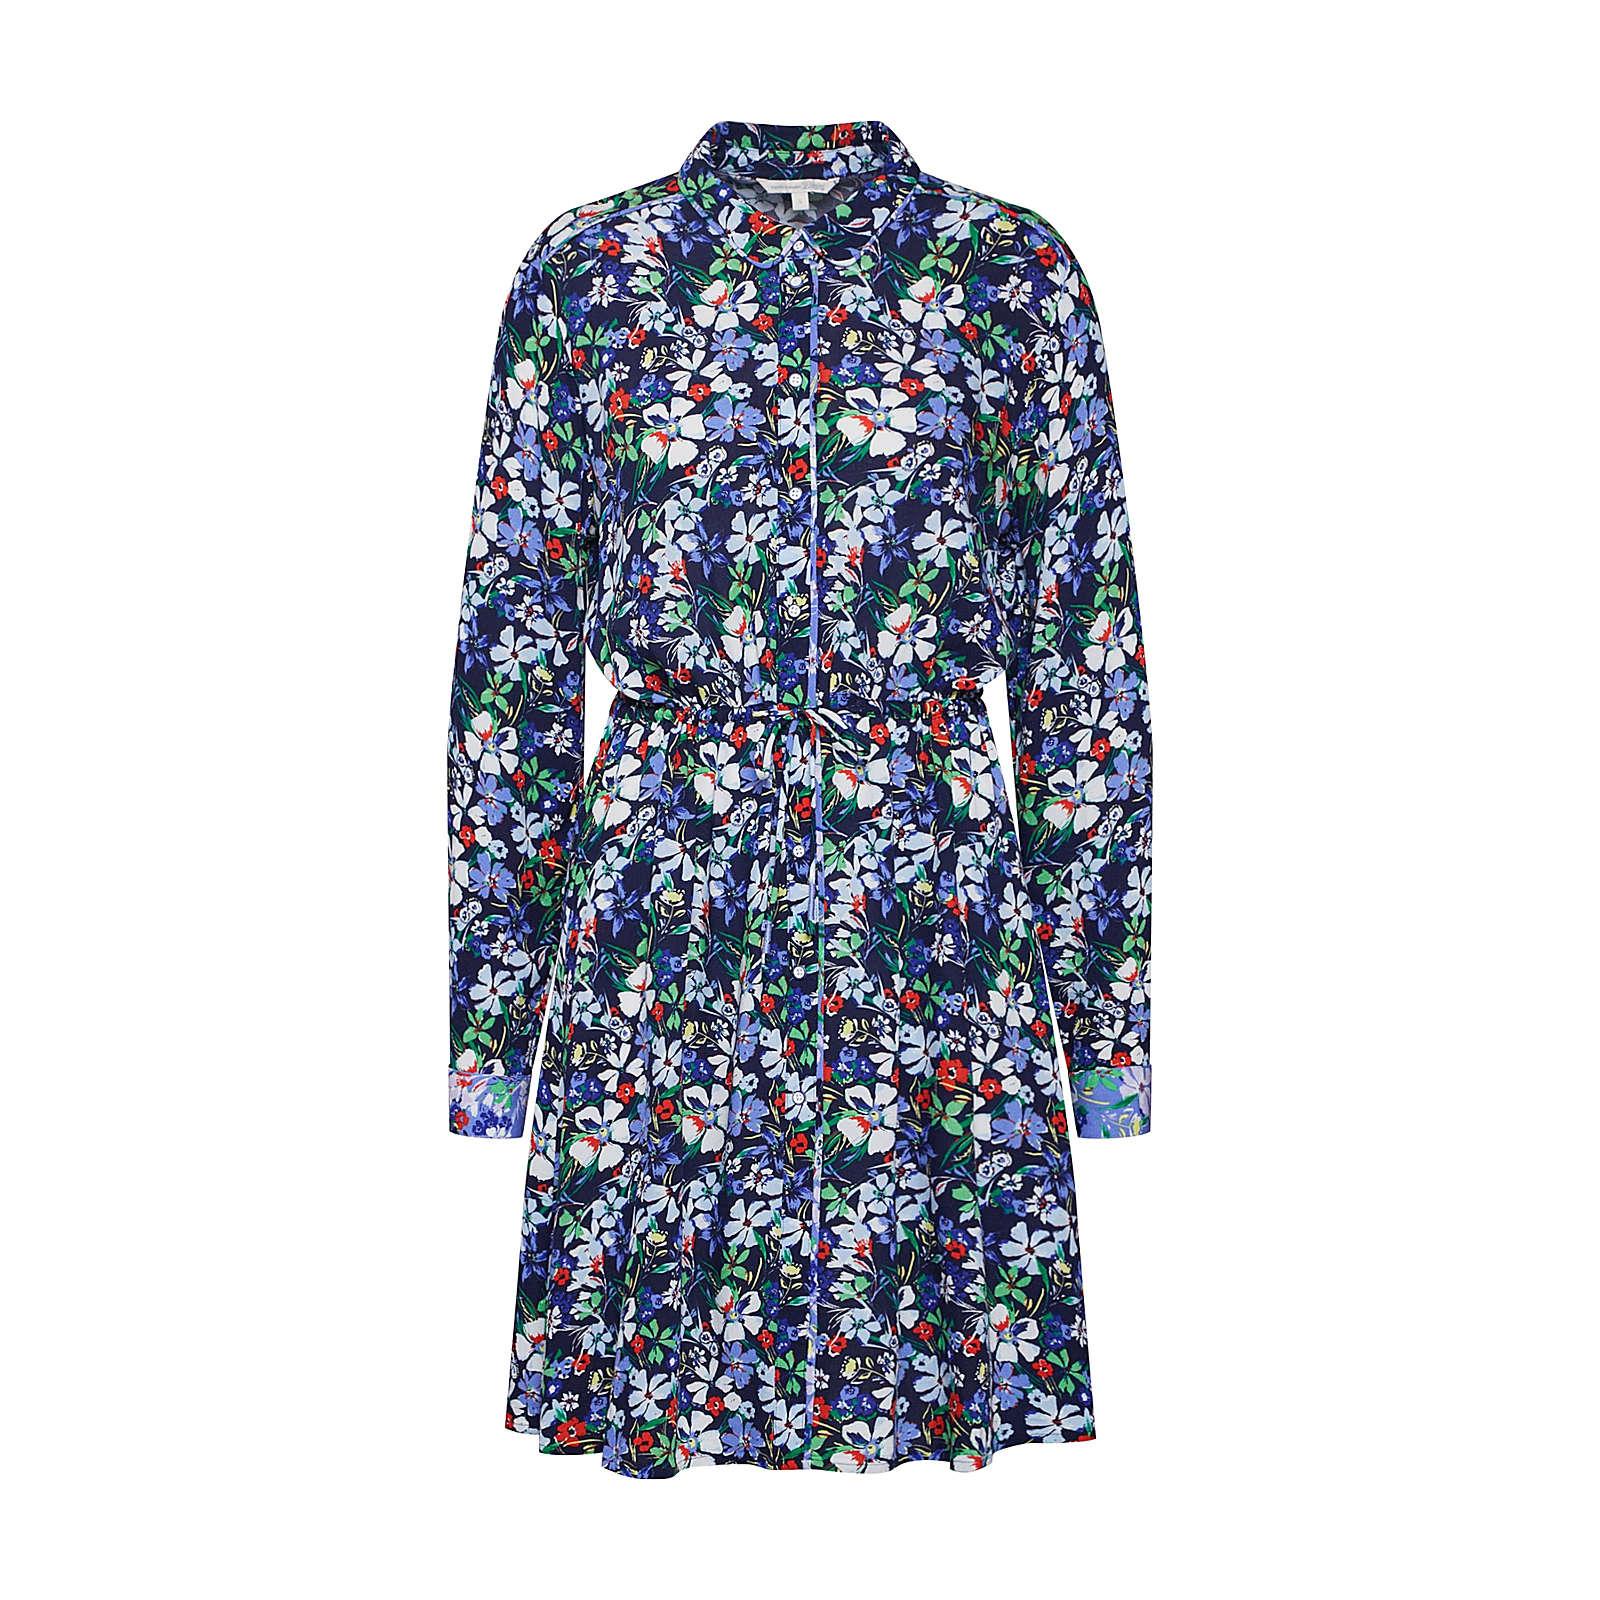 TOM TAILOR DENIM Blusenkleid Blusenkleider mehrfarbig Damen Gr. 38